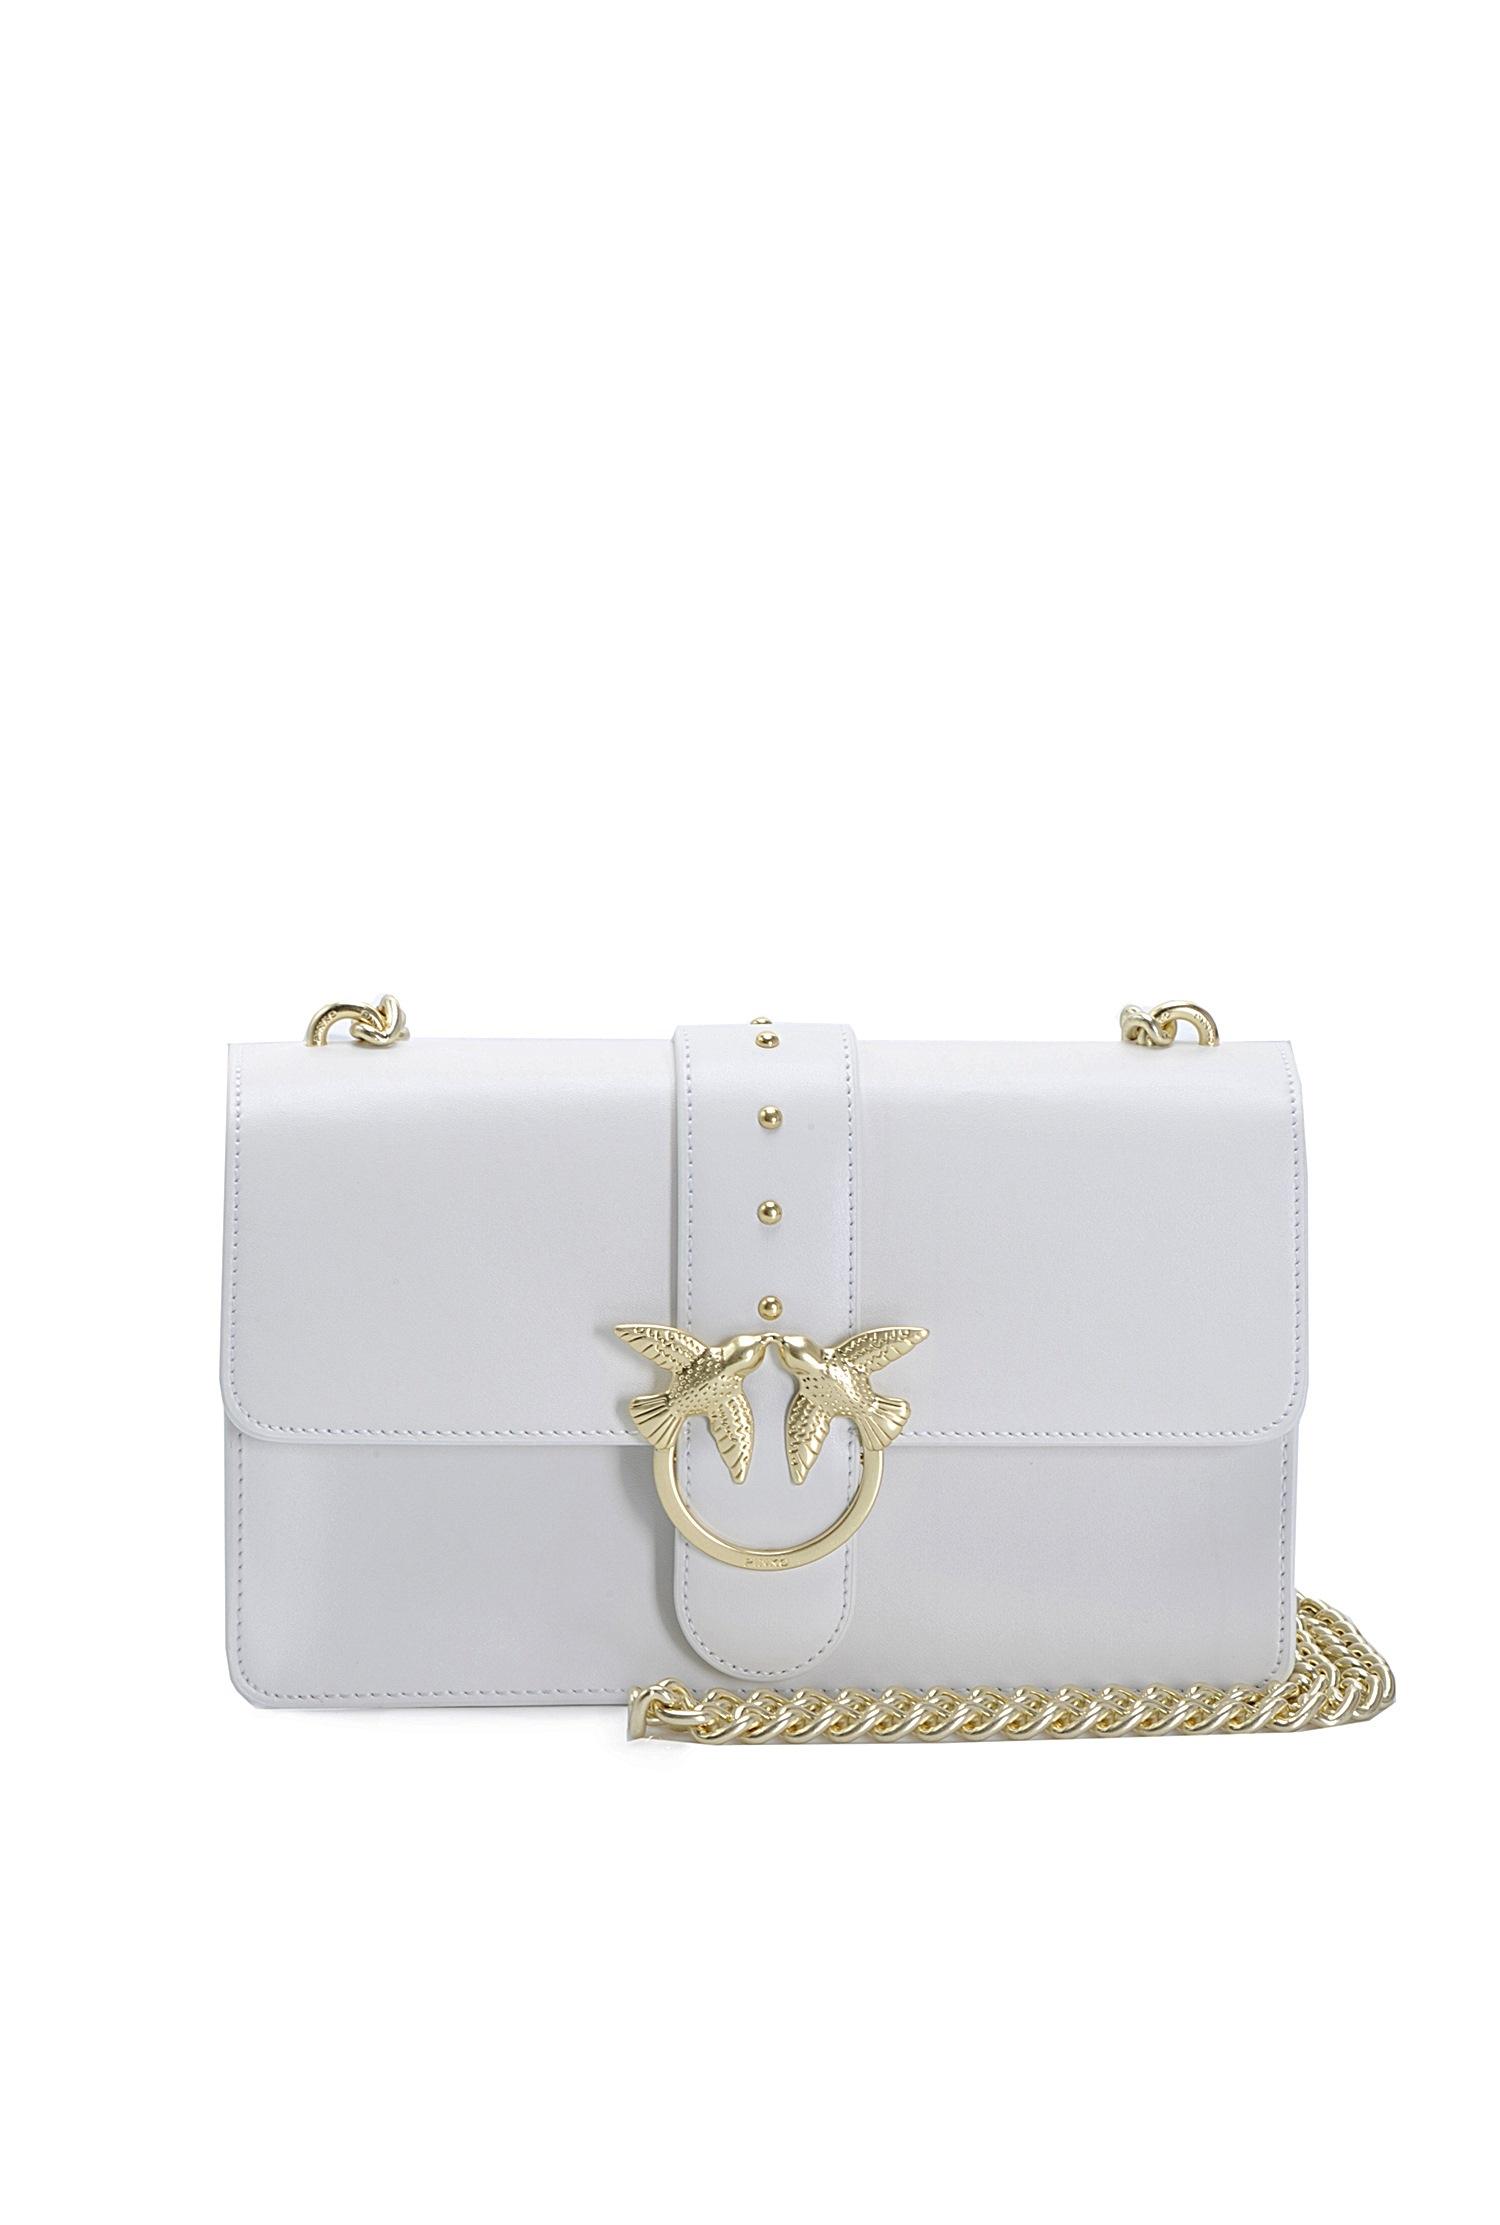 f883d2c754b Love Bag Simply in leather - PINKO